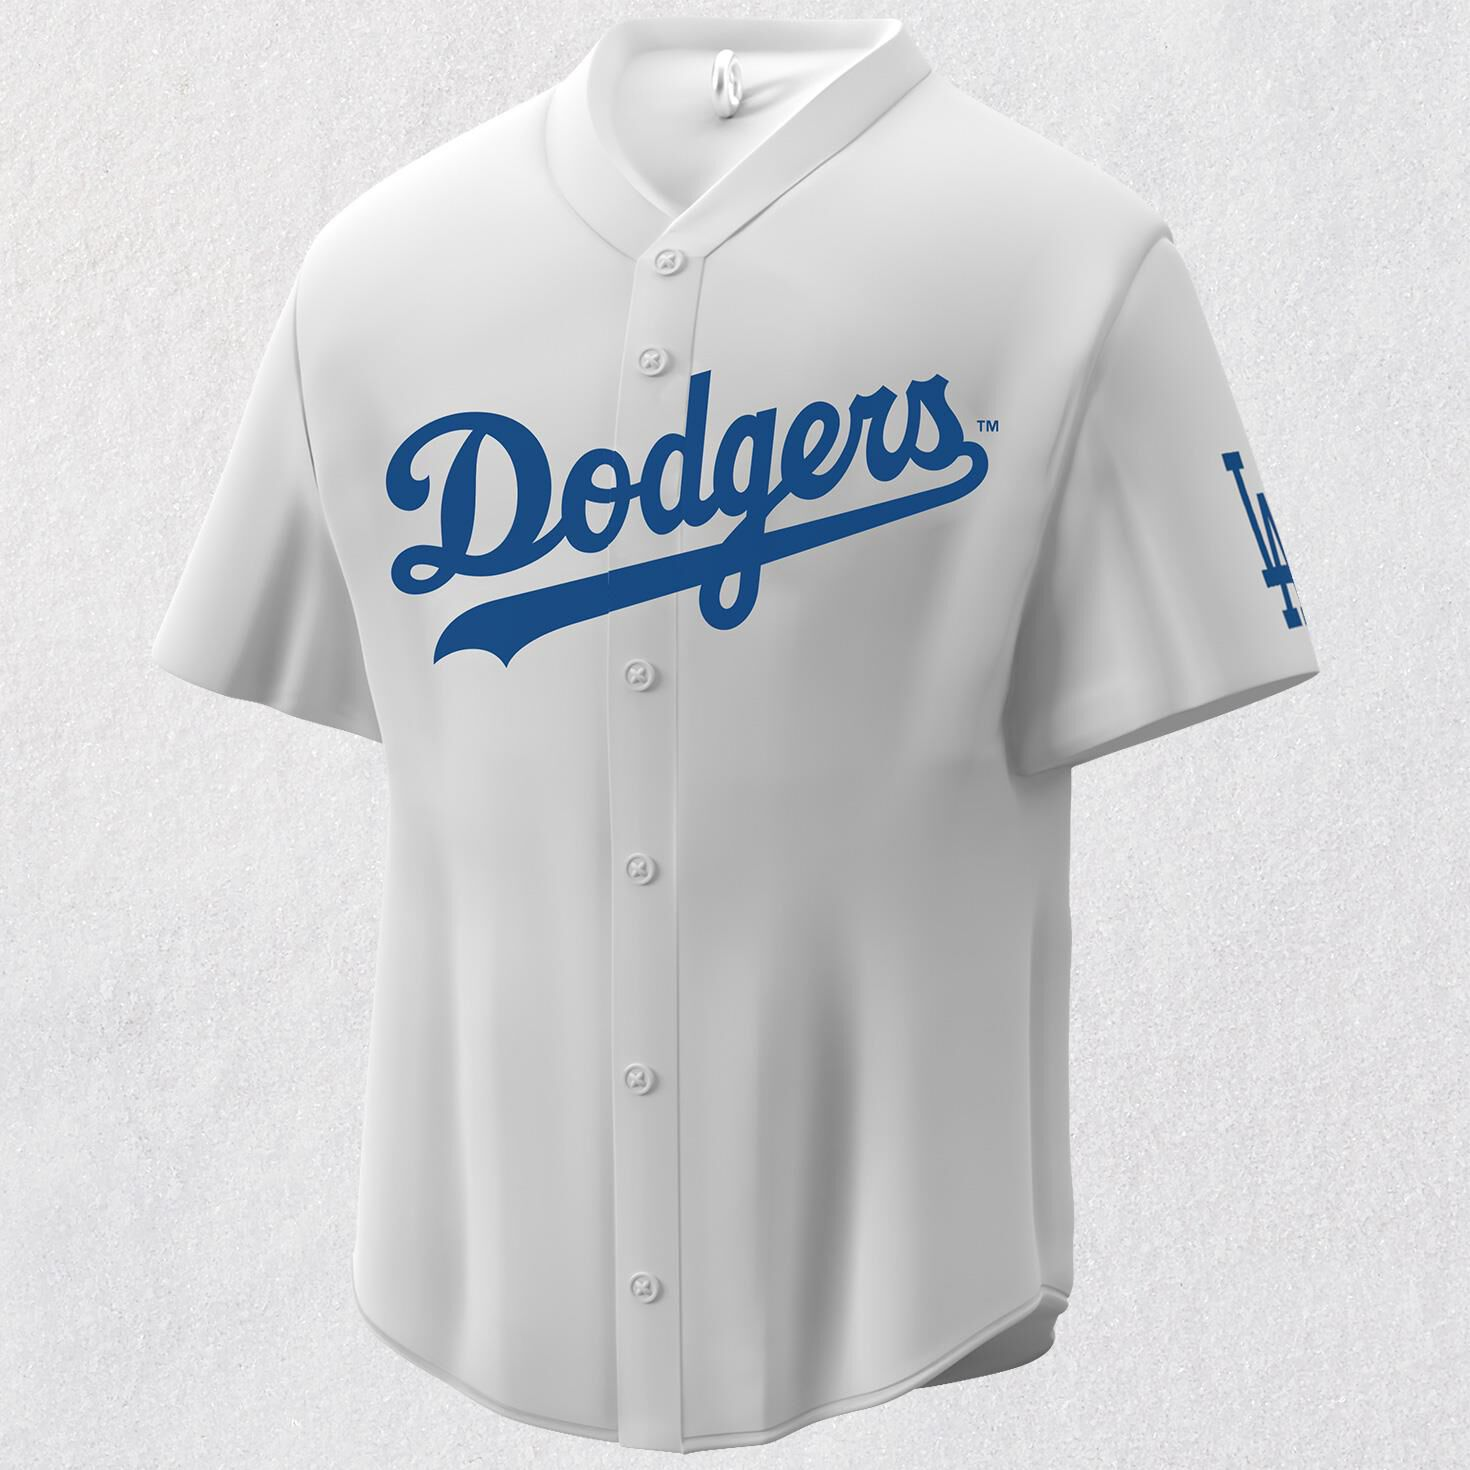 Dodgers fan appreciation day prizes for bridal shower